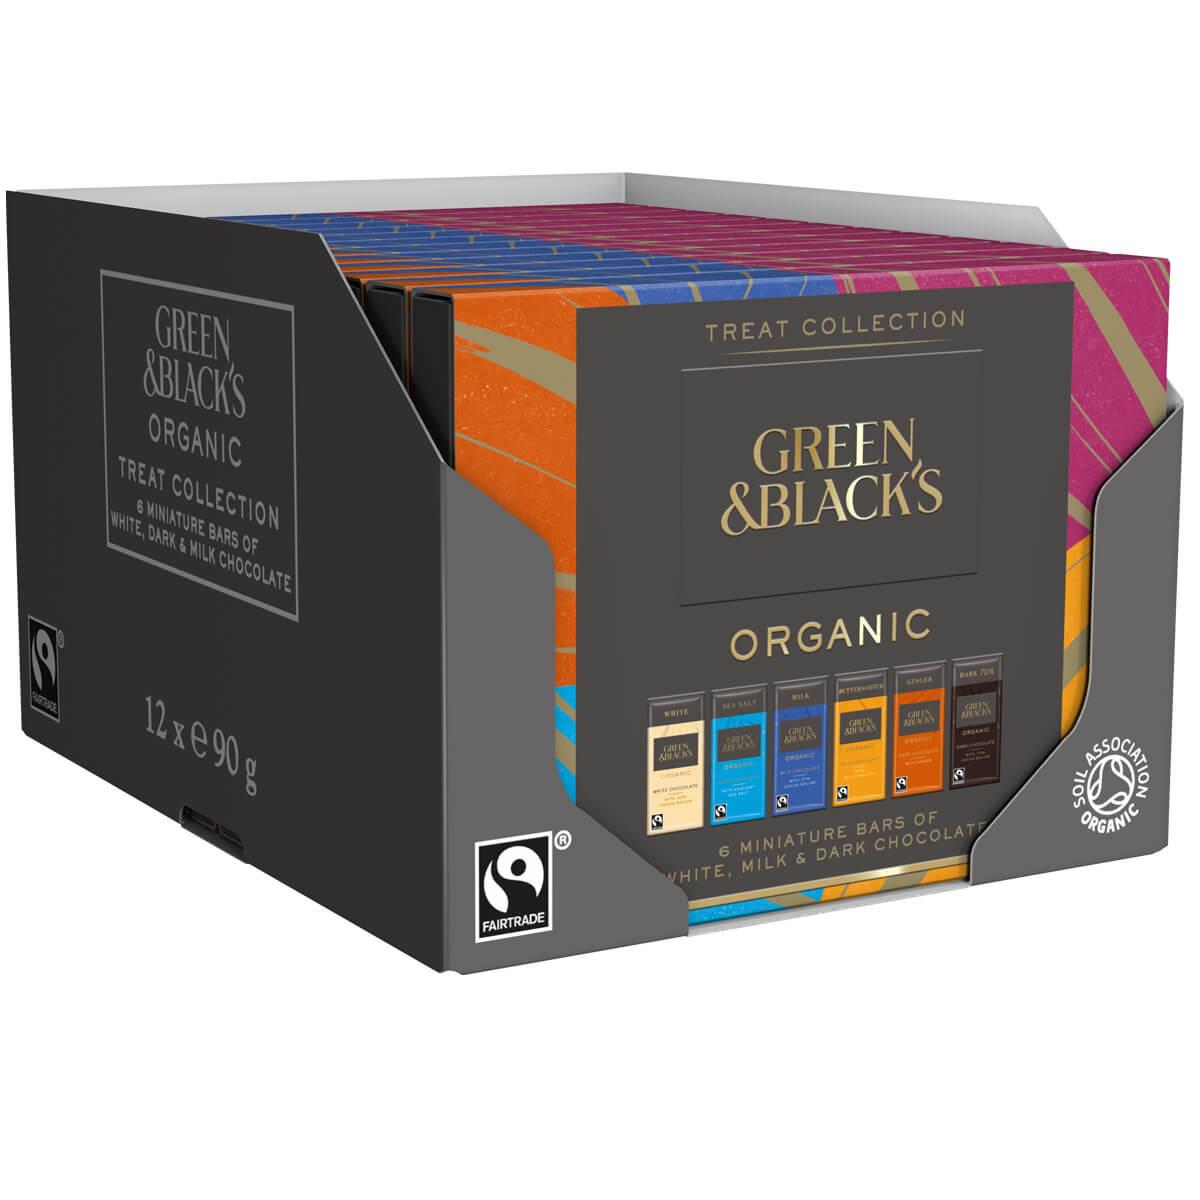 GB Organic Treat Collection 90g (Box of 12)